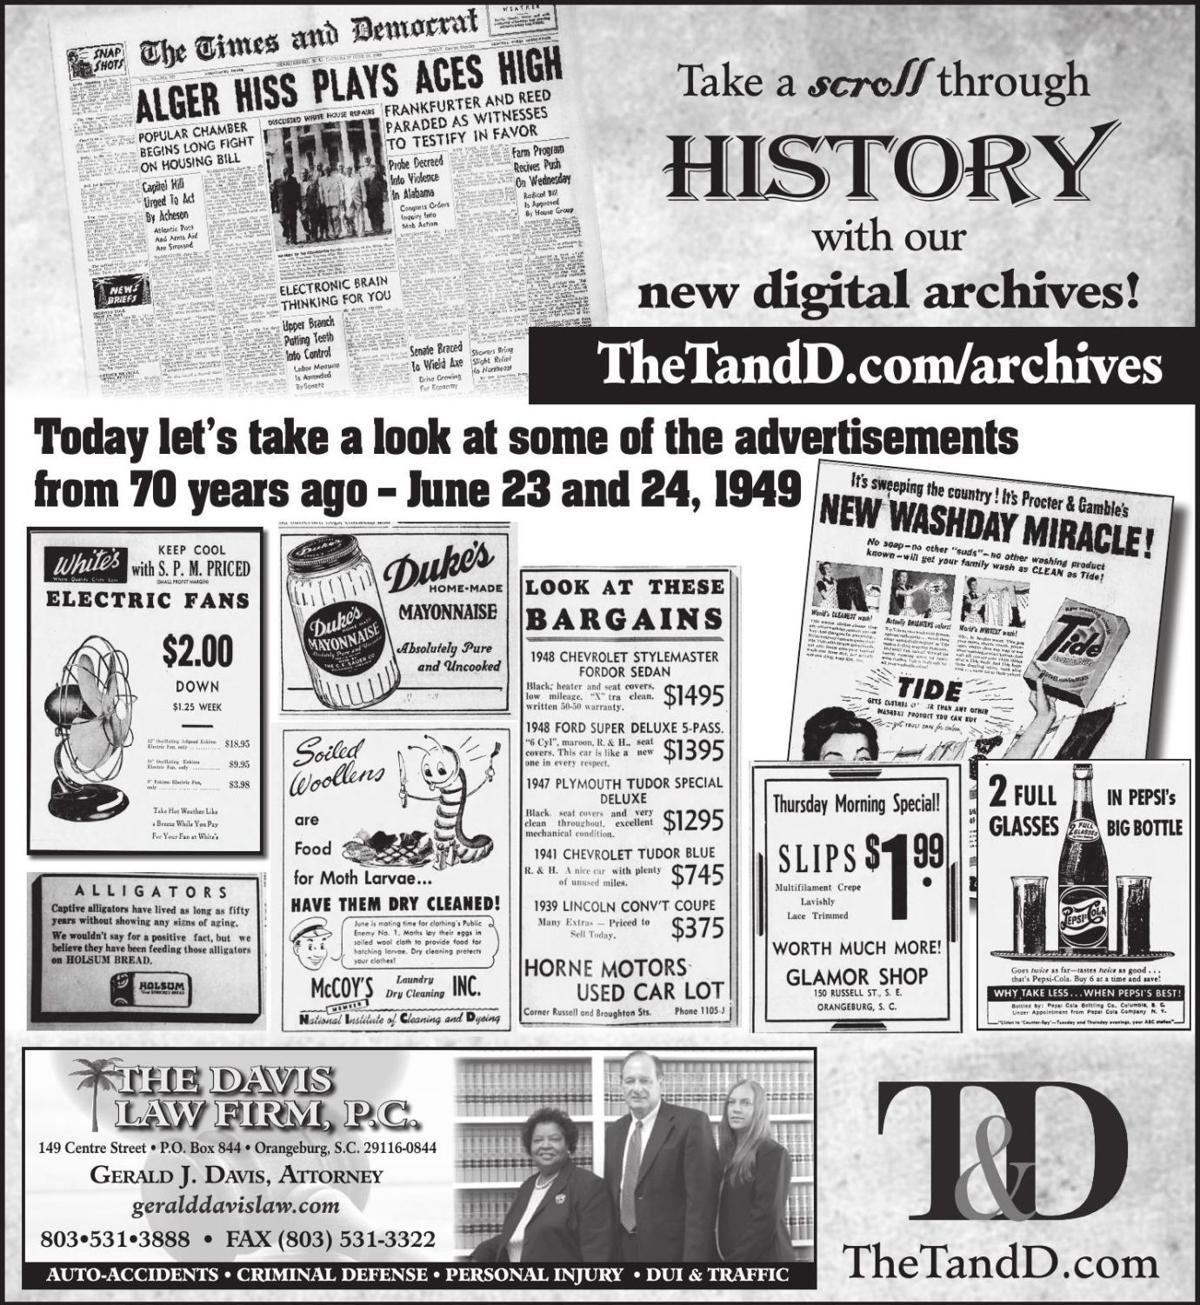 TheTandD.com/archives June 23, 2019